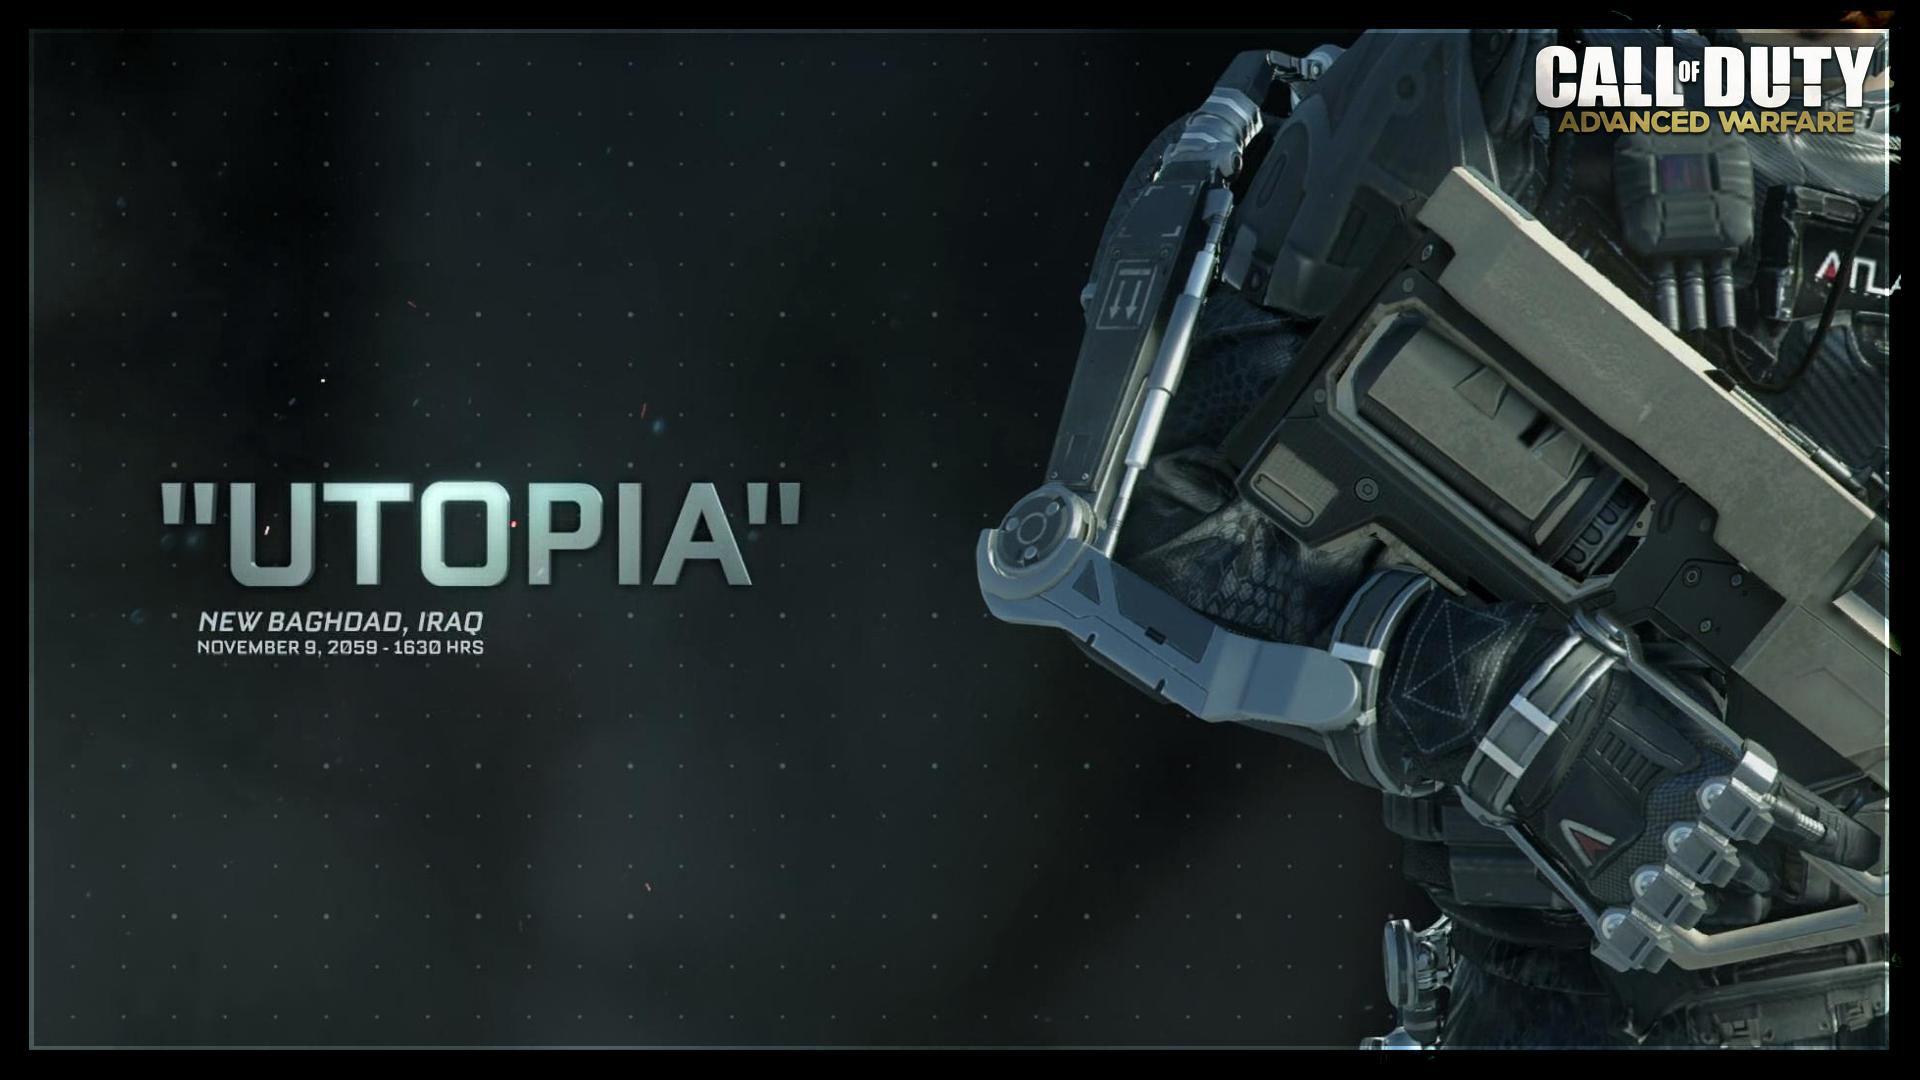 Call of Duty Advanced Warfare Utopia Mission Giriş Resmi